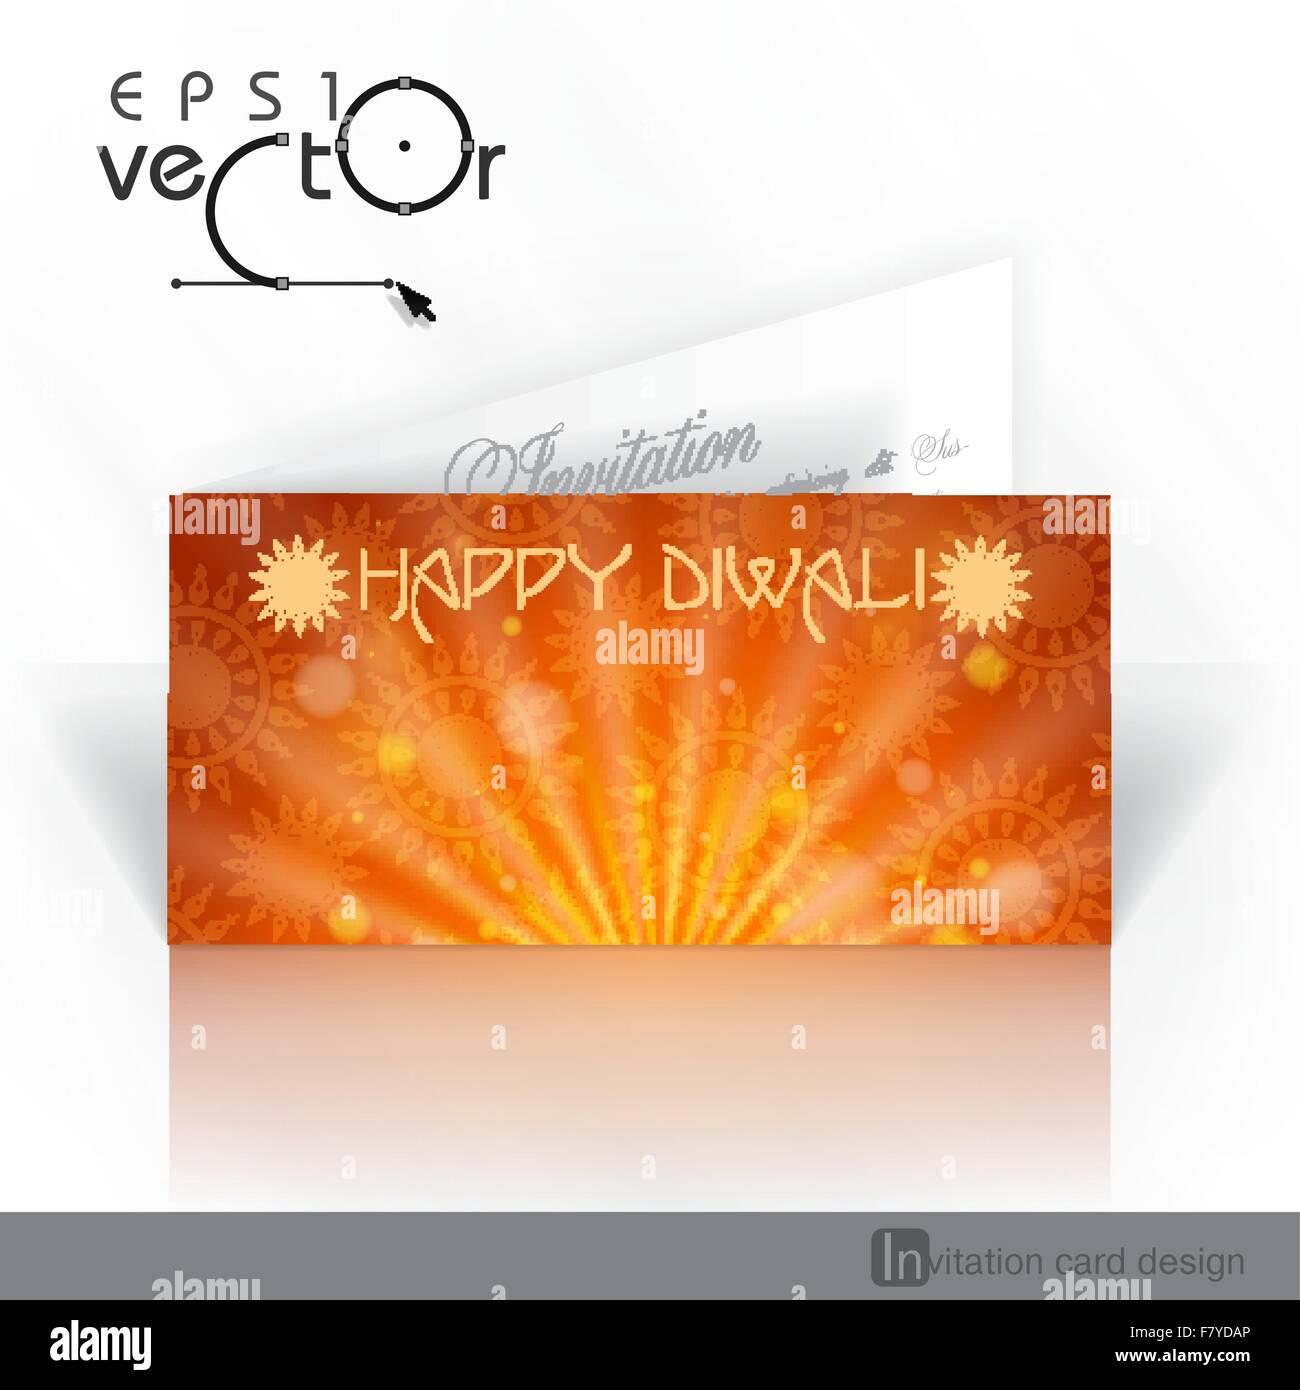 Invitation Card Design Template Stock Vector Art